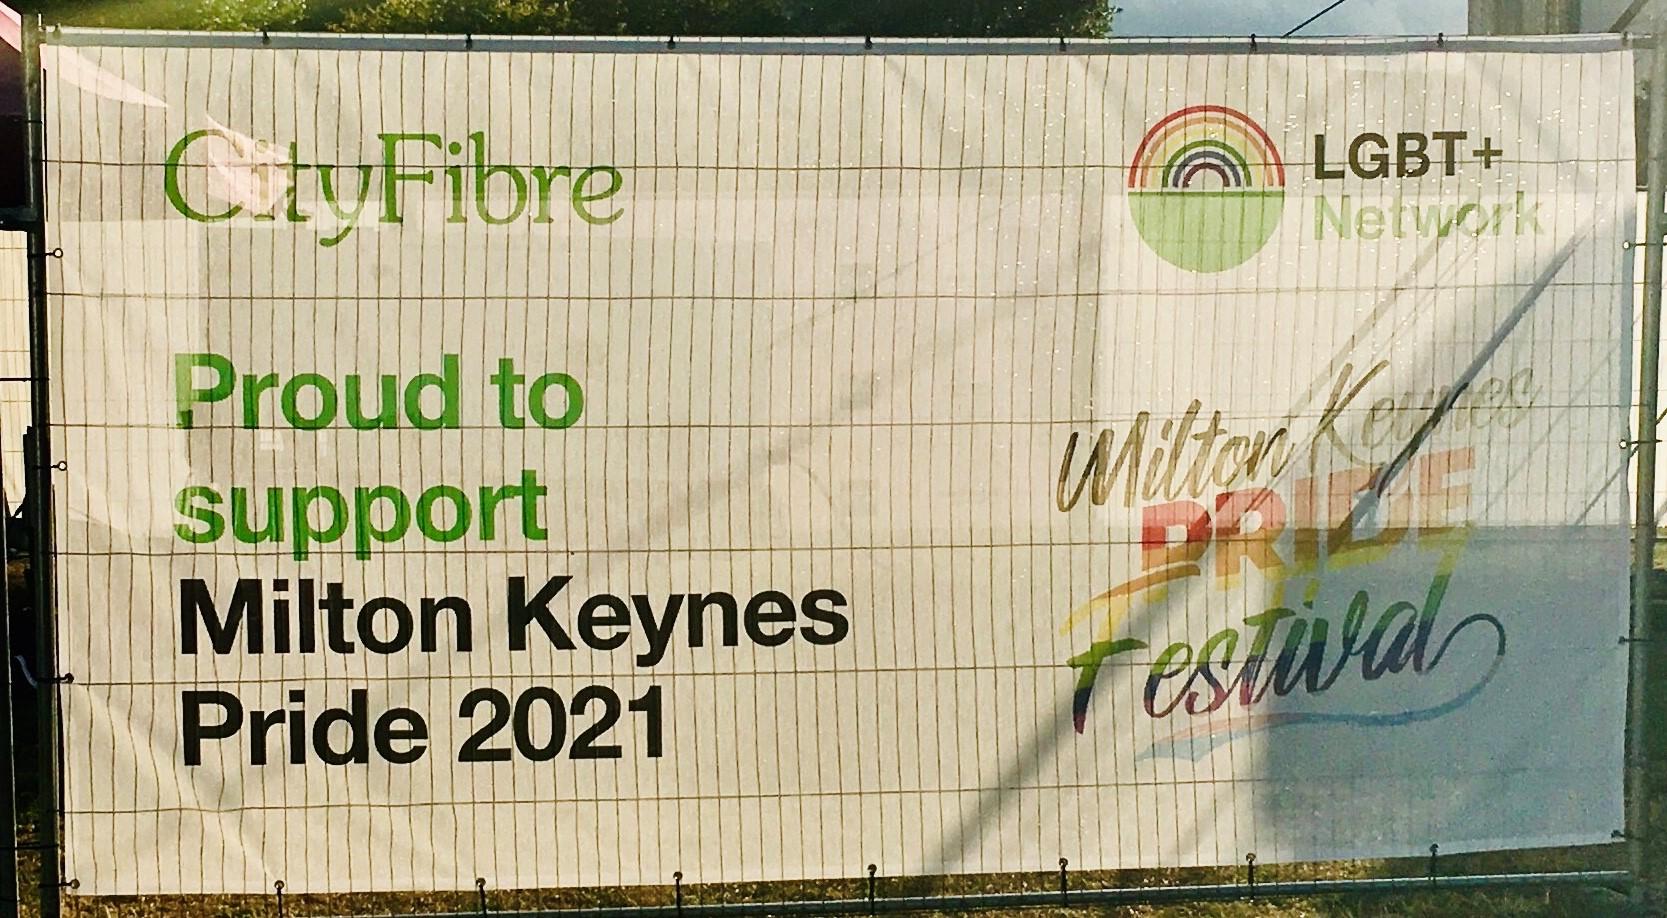 CityFibre - Sponsoring MK Pride 2021